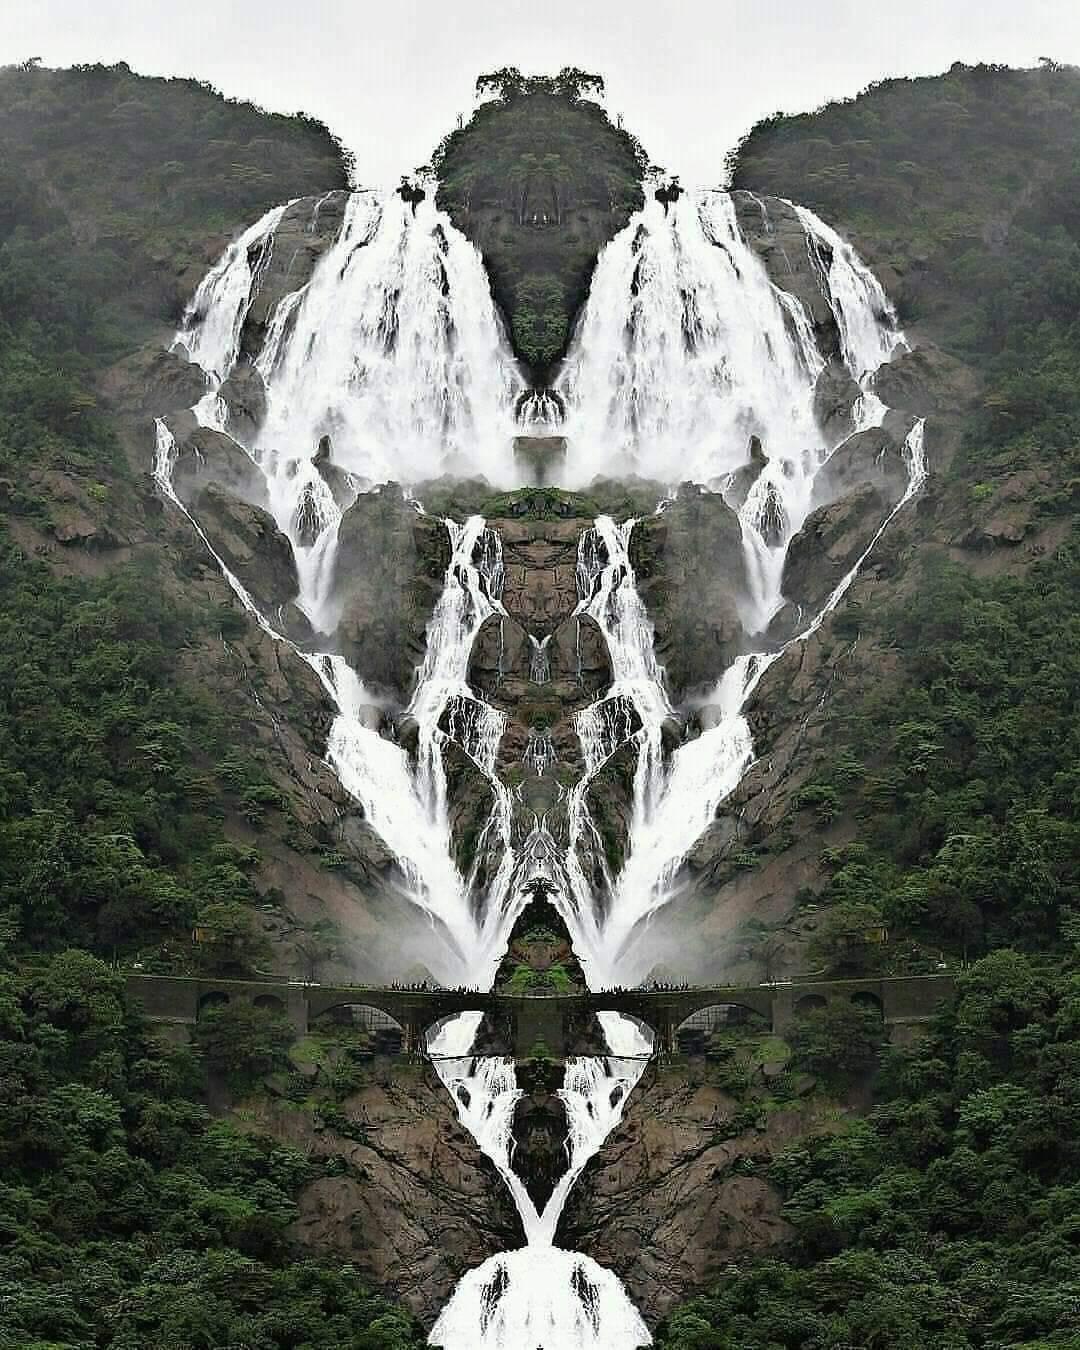 Dudhsagar Falls in Goa, India